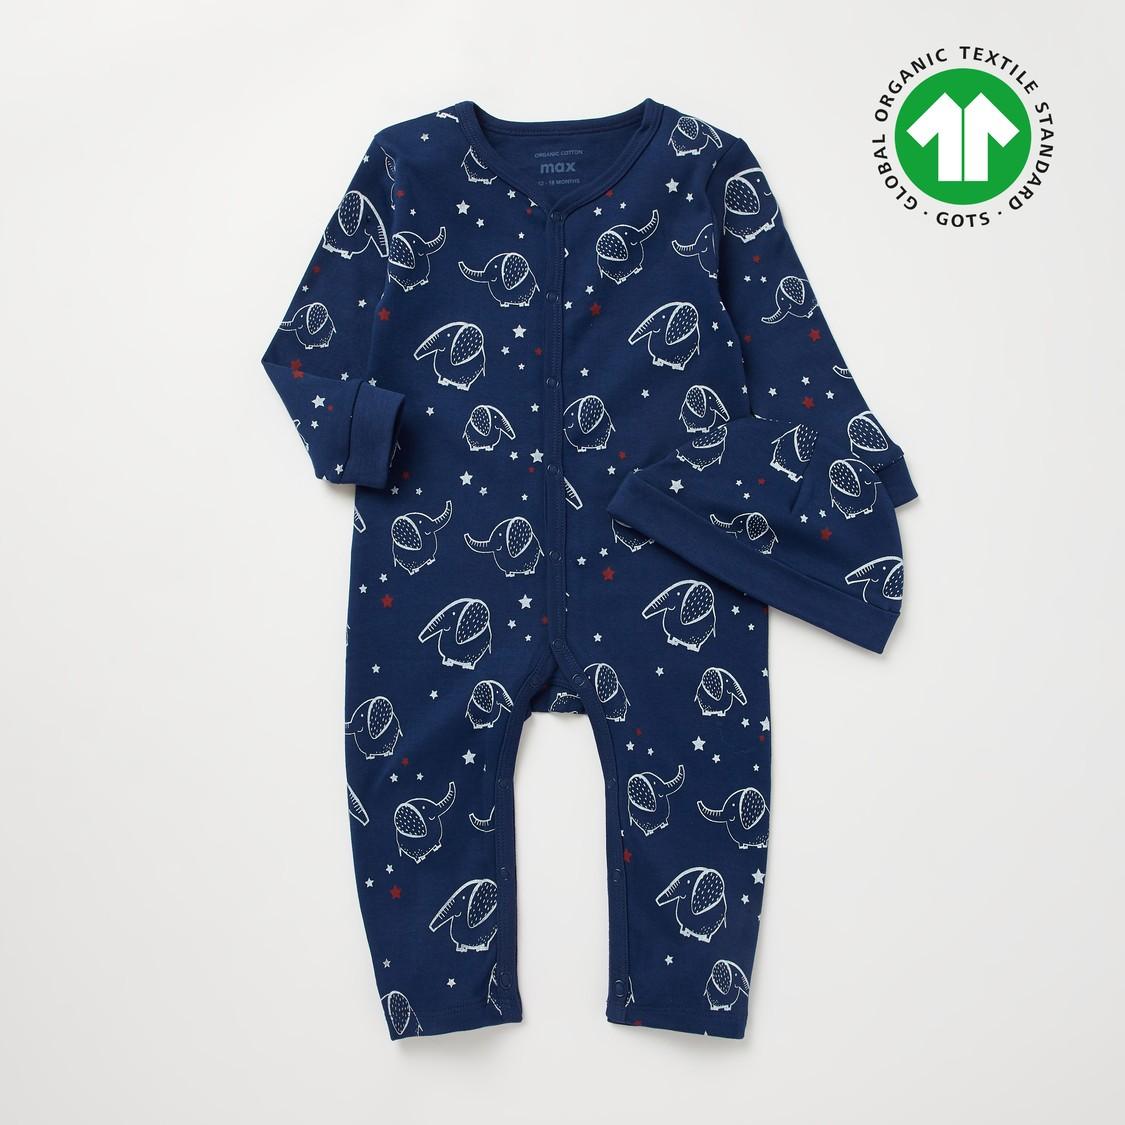 Elephant Print GOTS Organic Cotton Long Sleeves Sleepsuit with Cap